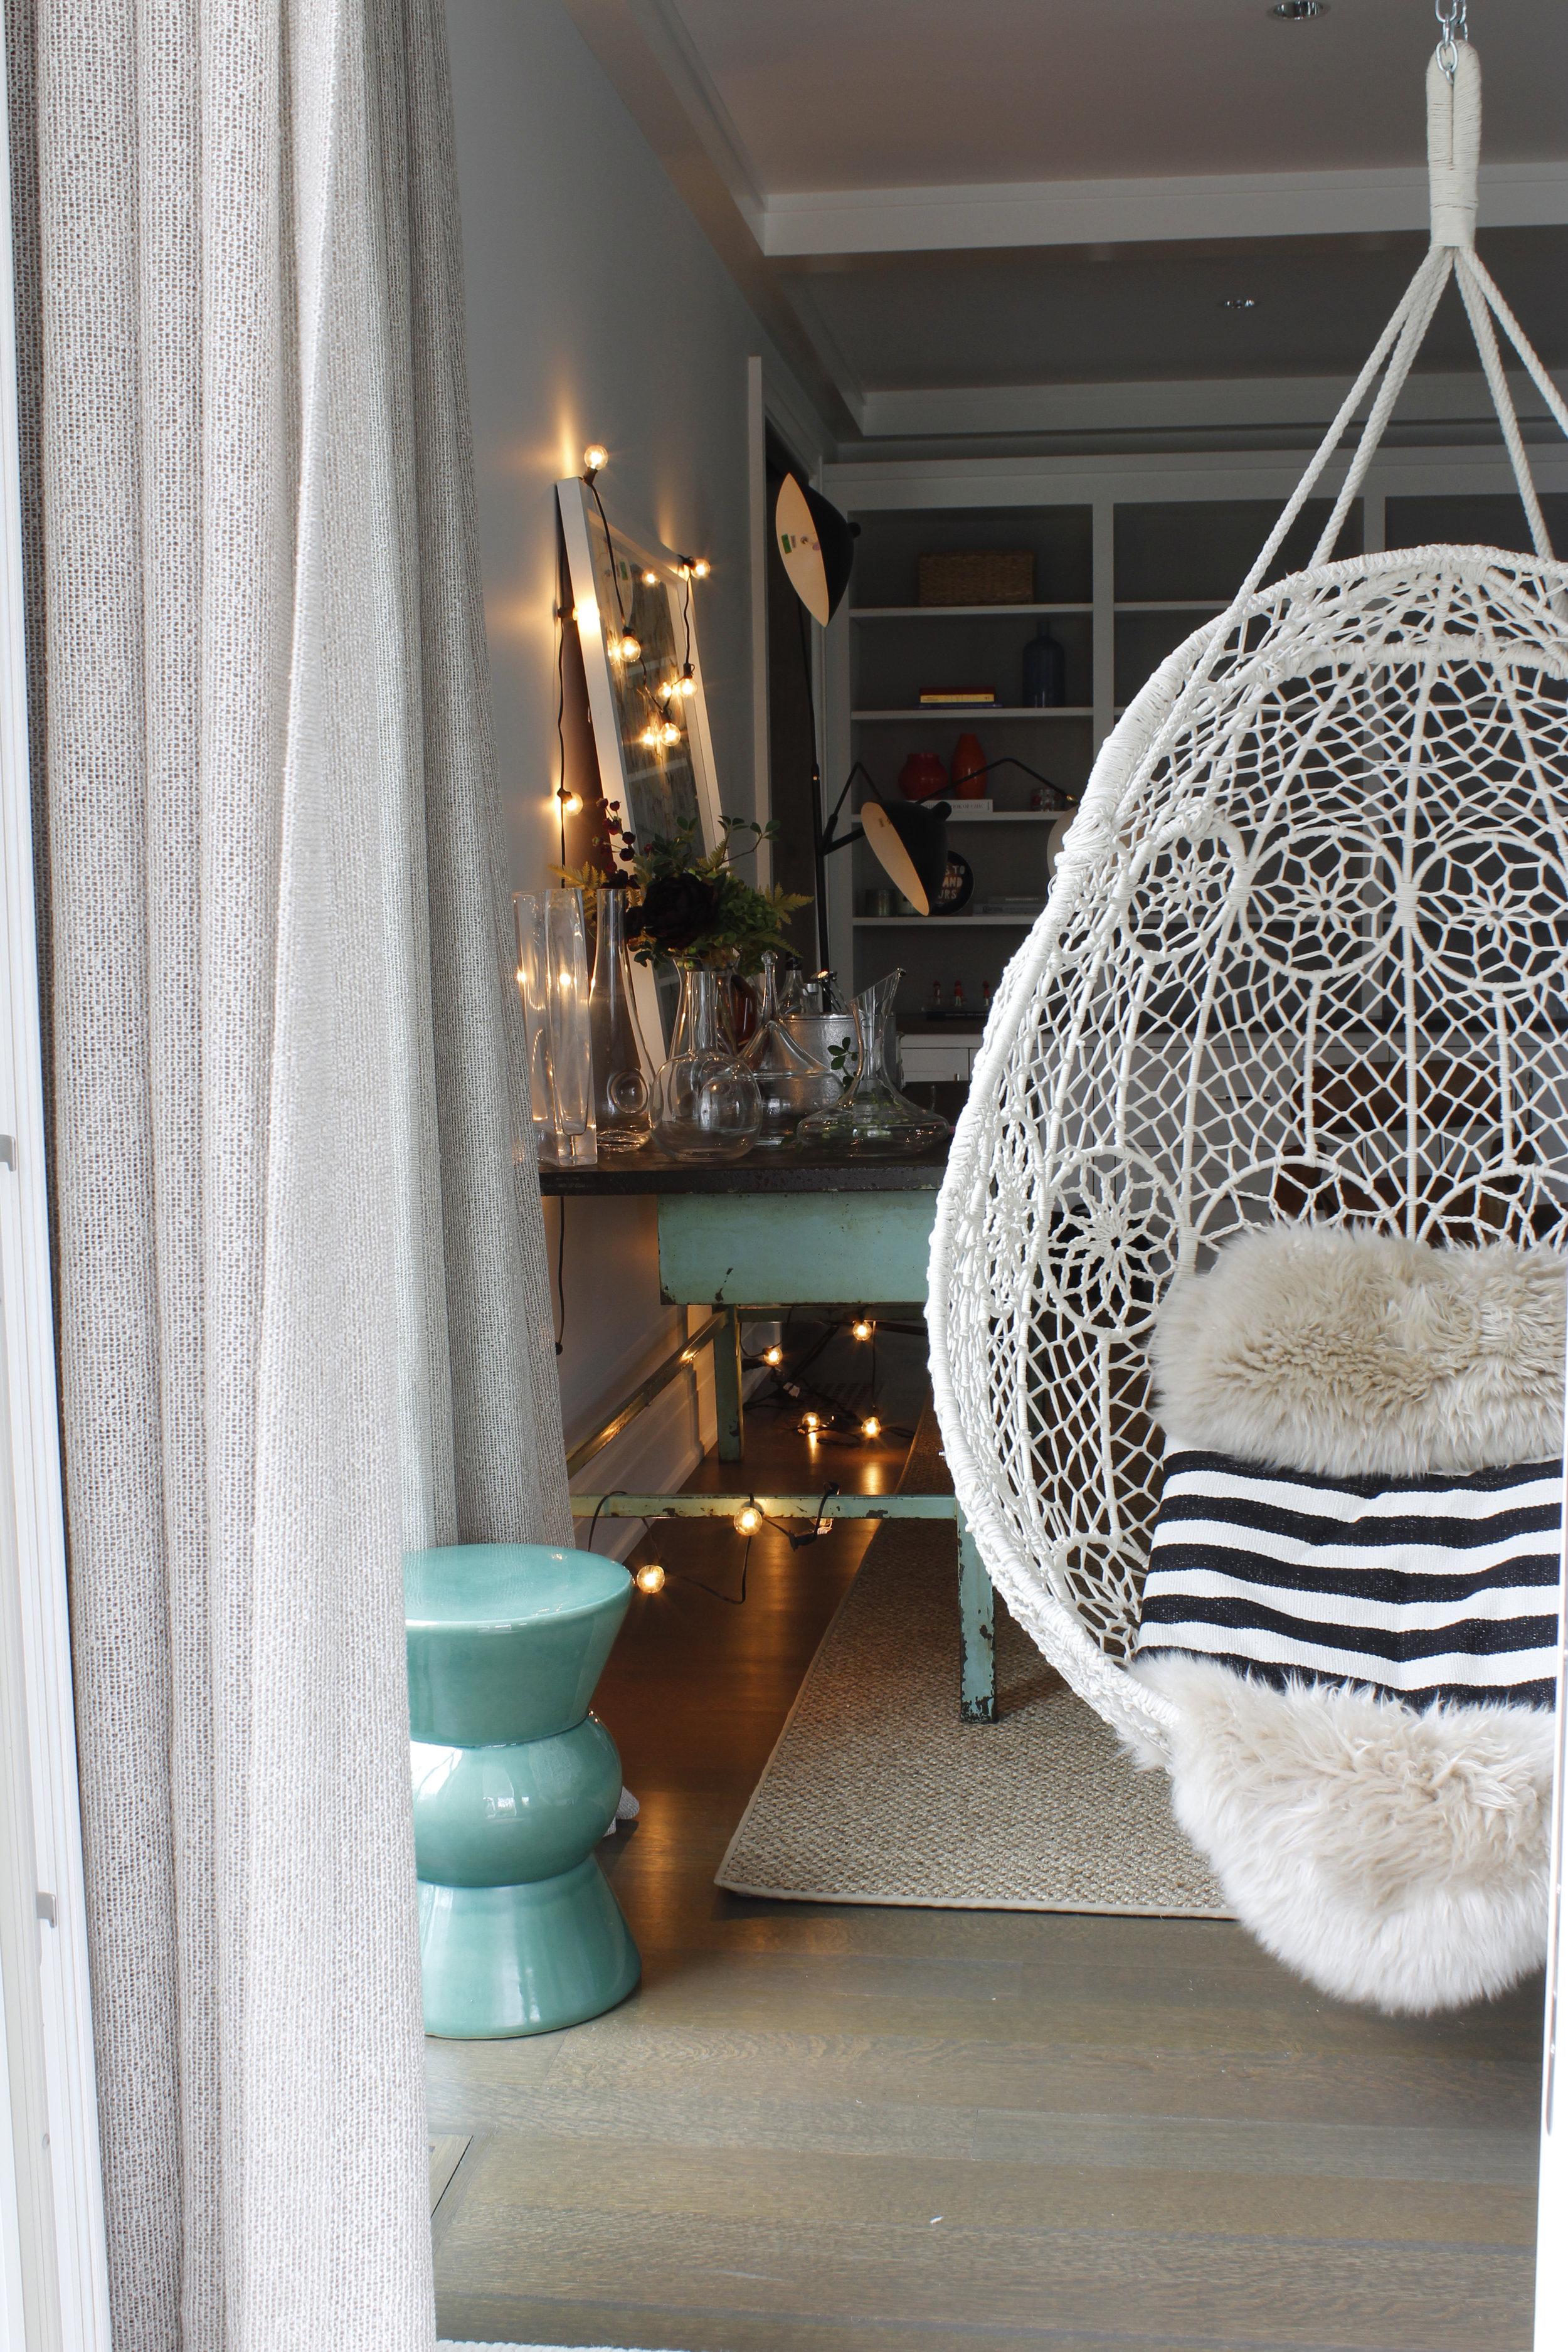 Nana Cunha - 4 Living room detail b.jpg